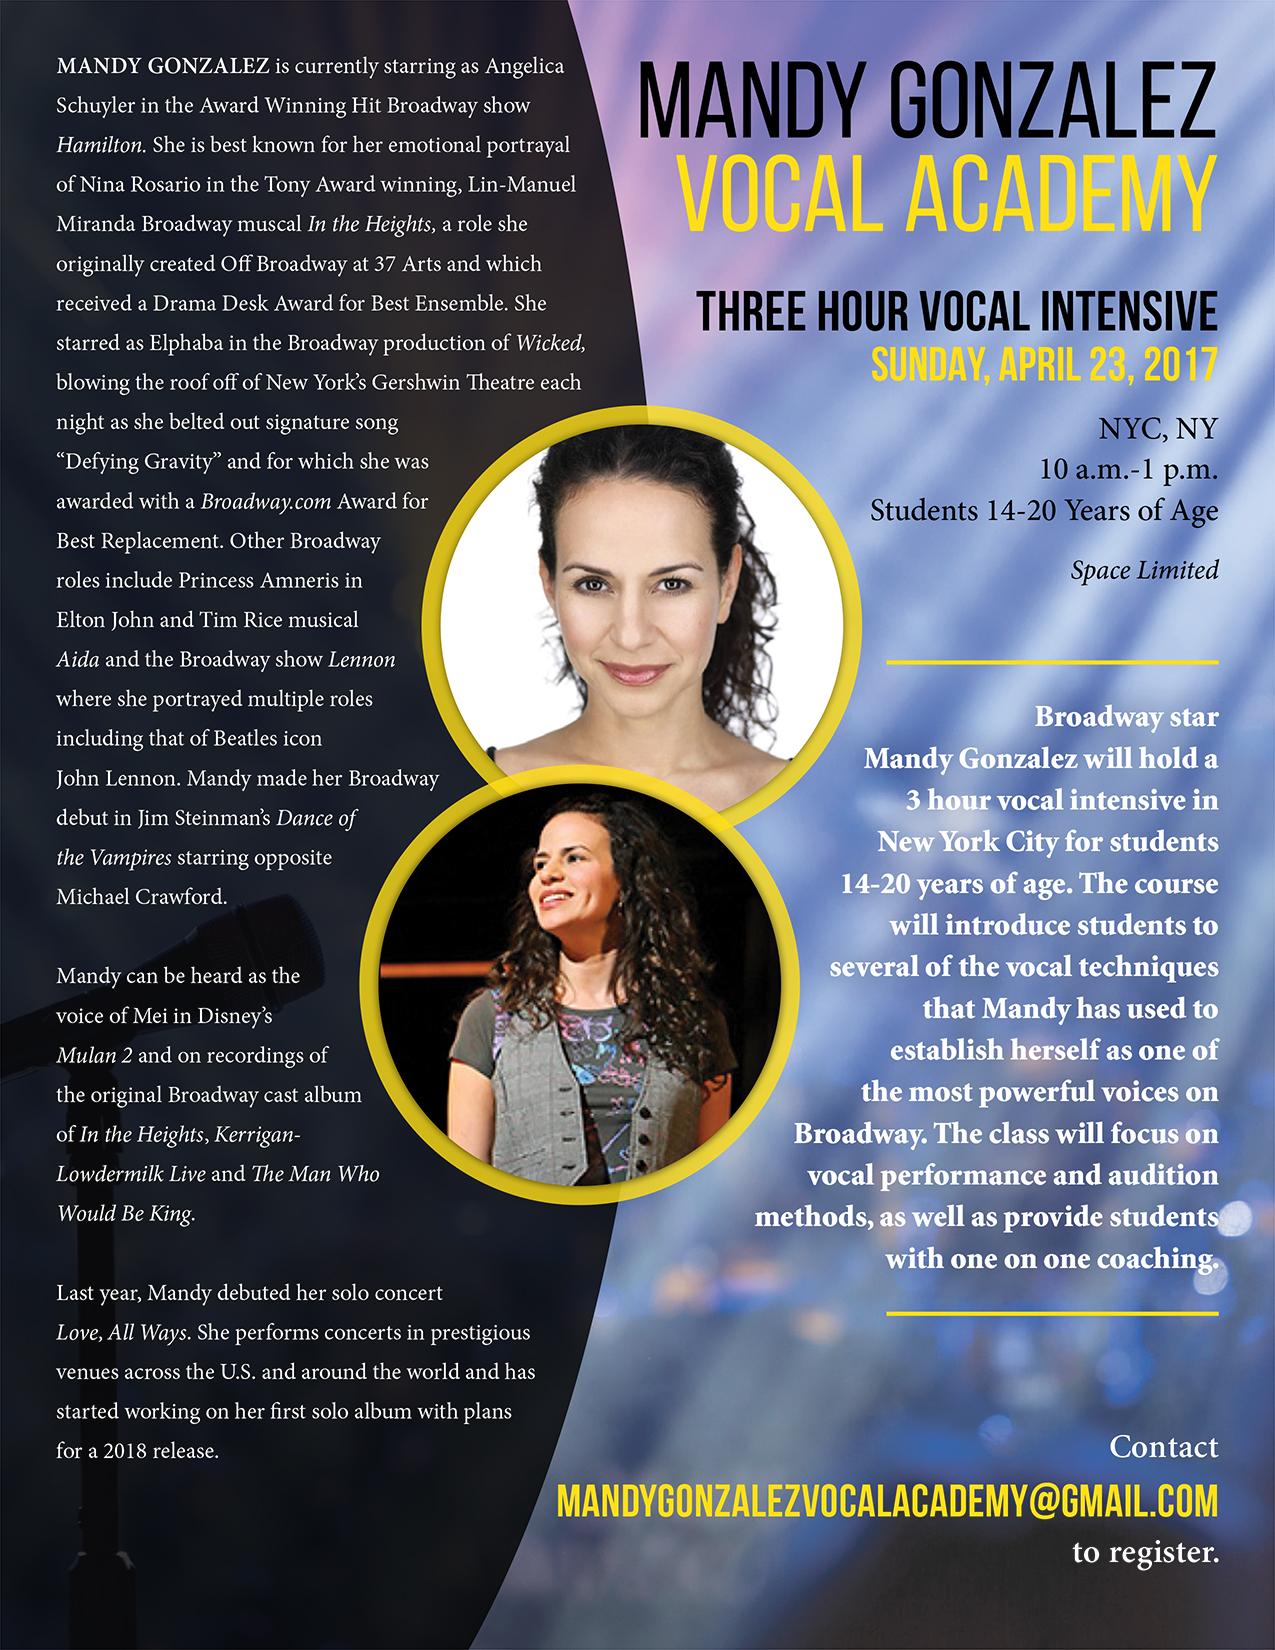 Mandy Gonzalez Vocal Academy